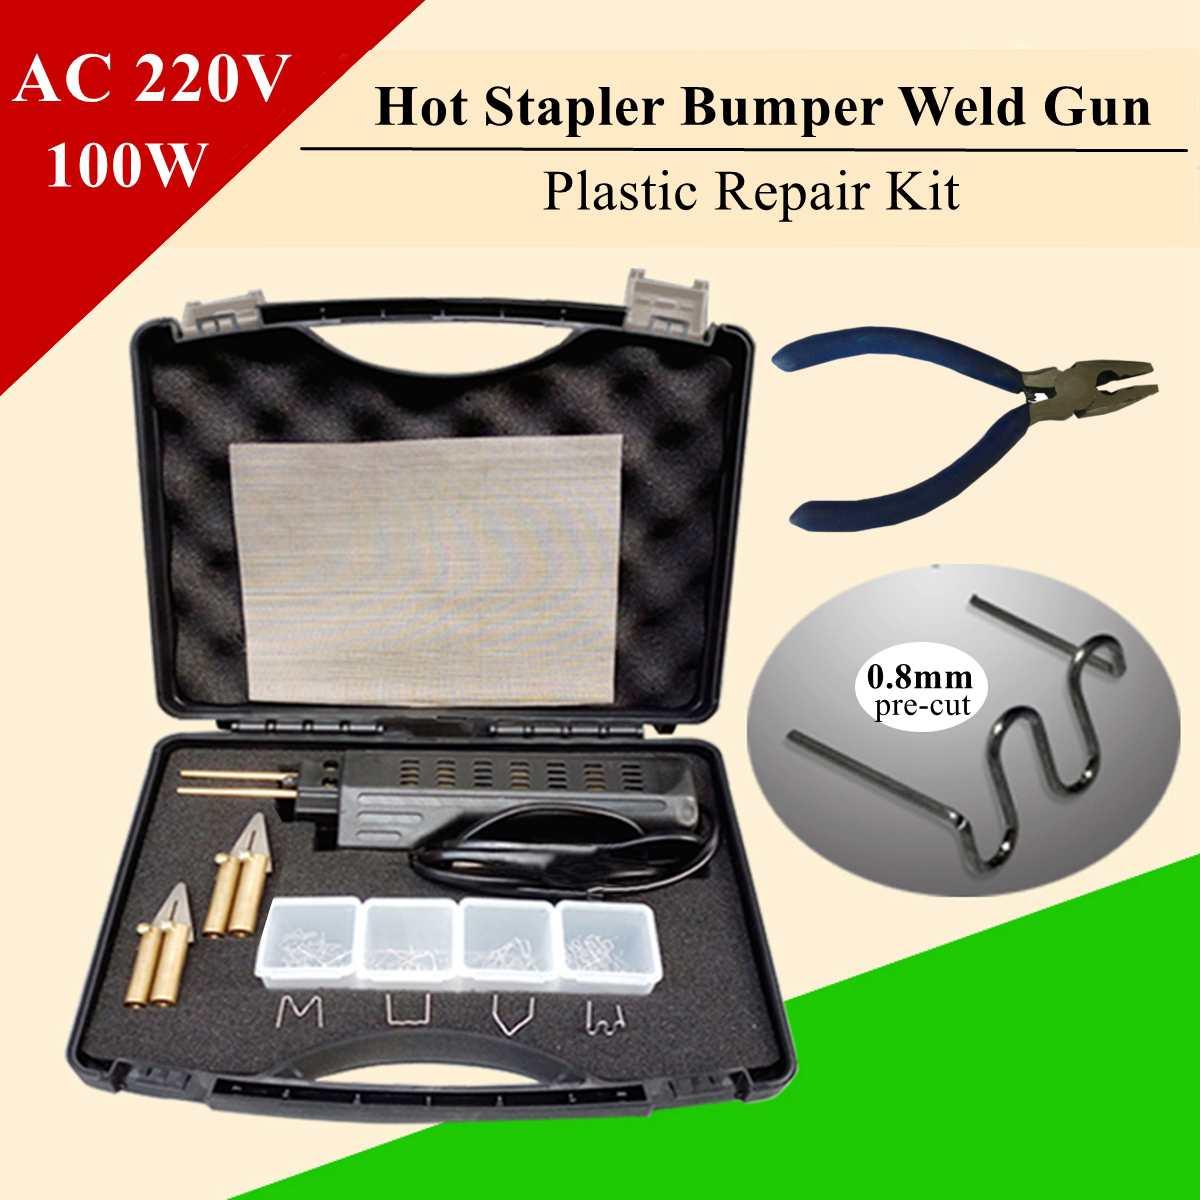 206pcs Hot Stapler For Repairing Car Bumper Fender Fairing Welder Plastic Repair Kit Portable Plastic Welding Machine